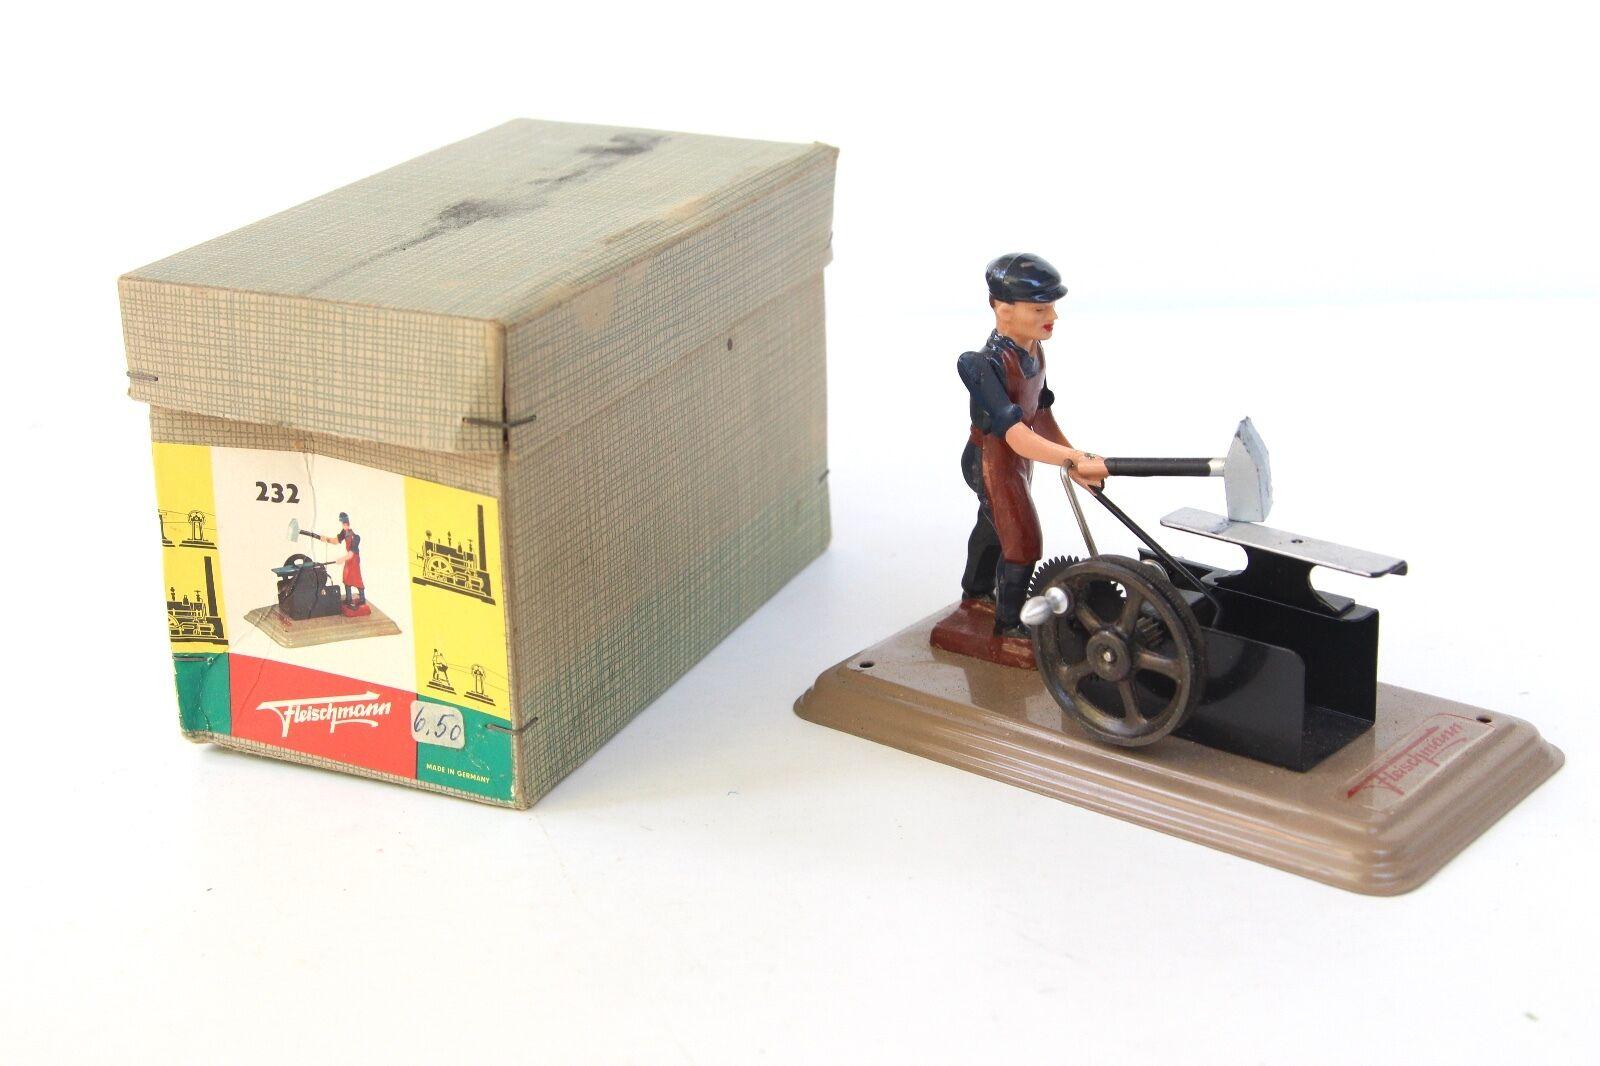 Fleischmann Herrero & Yunque con caja de hojalata-Juguete de vapor vivo además